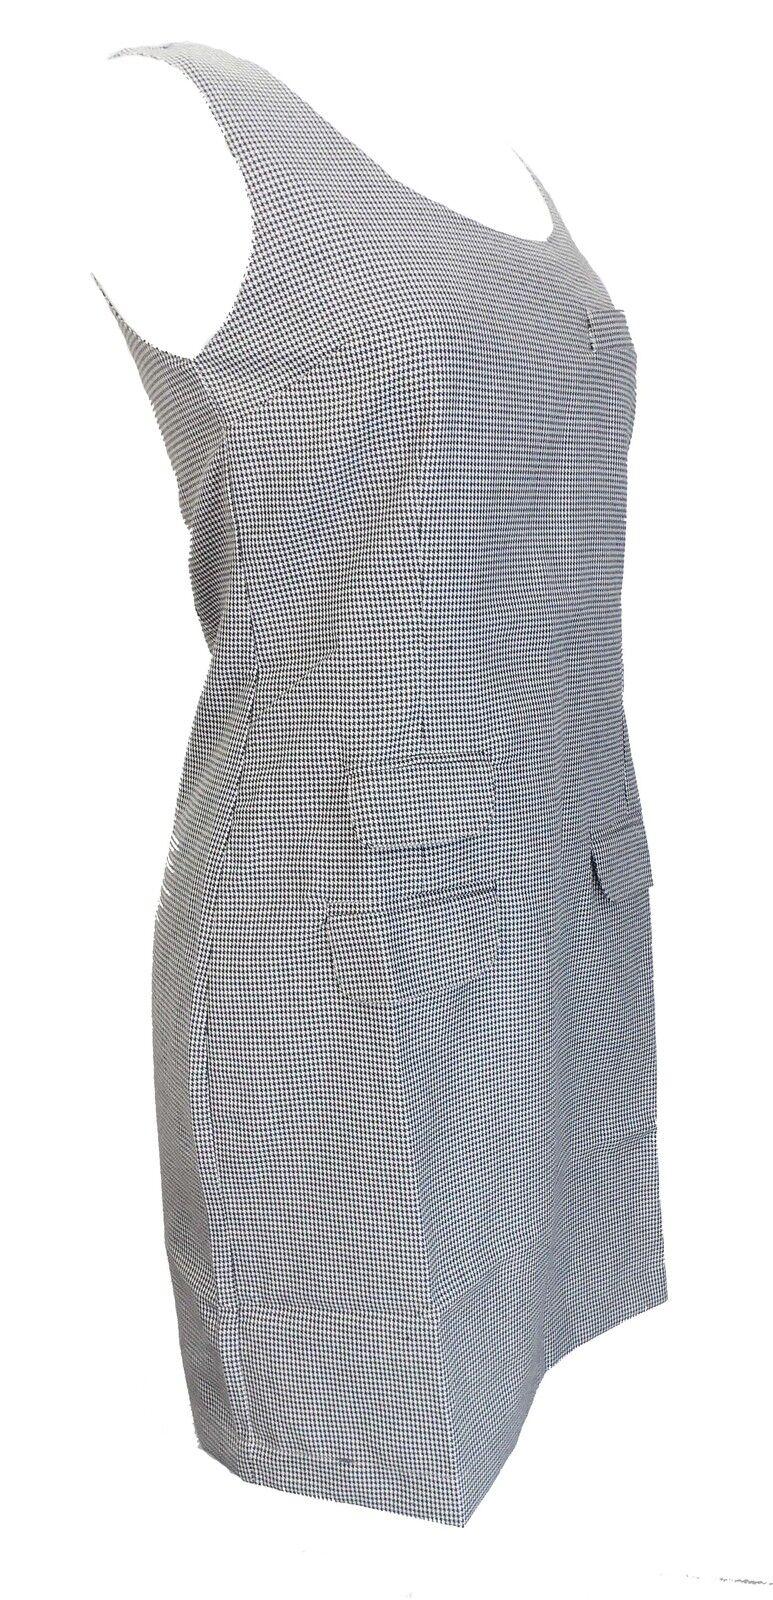 Ladies Retro Mod Mod Mod Dogtooth Pinafore Tunic Dress ba9e1b